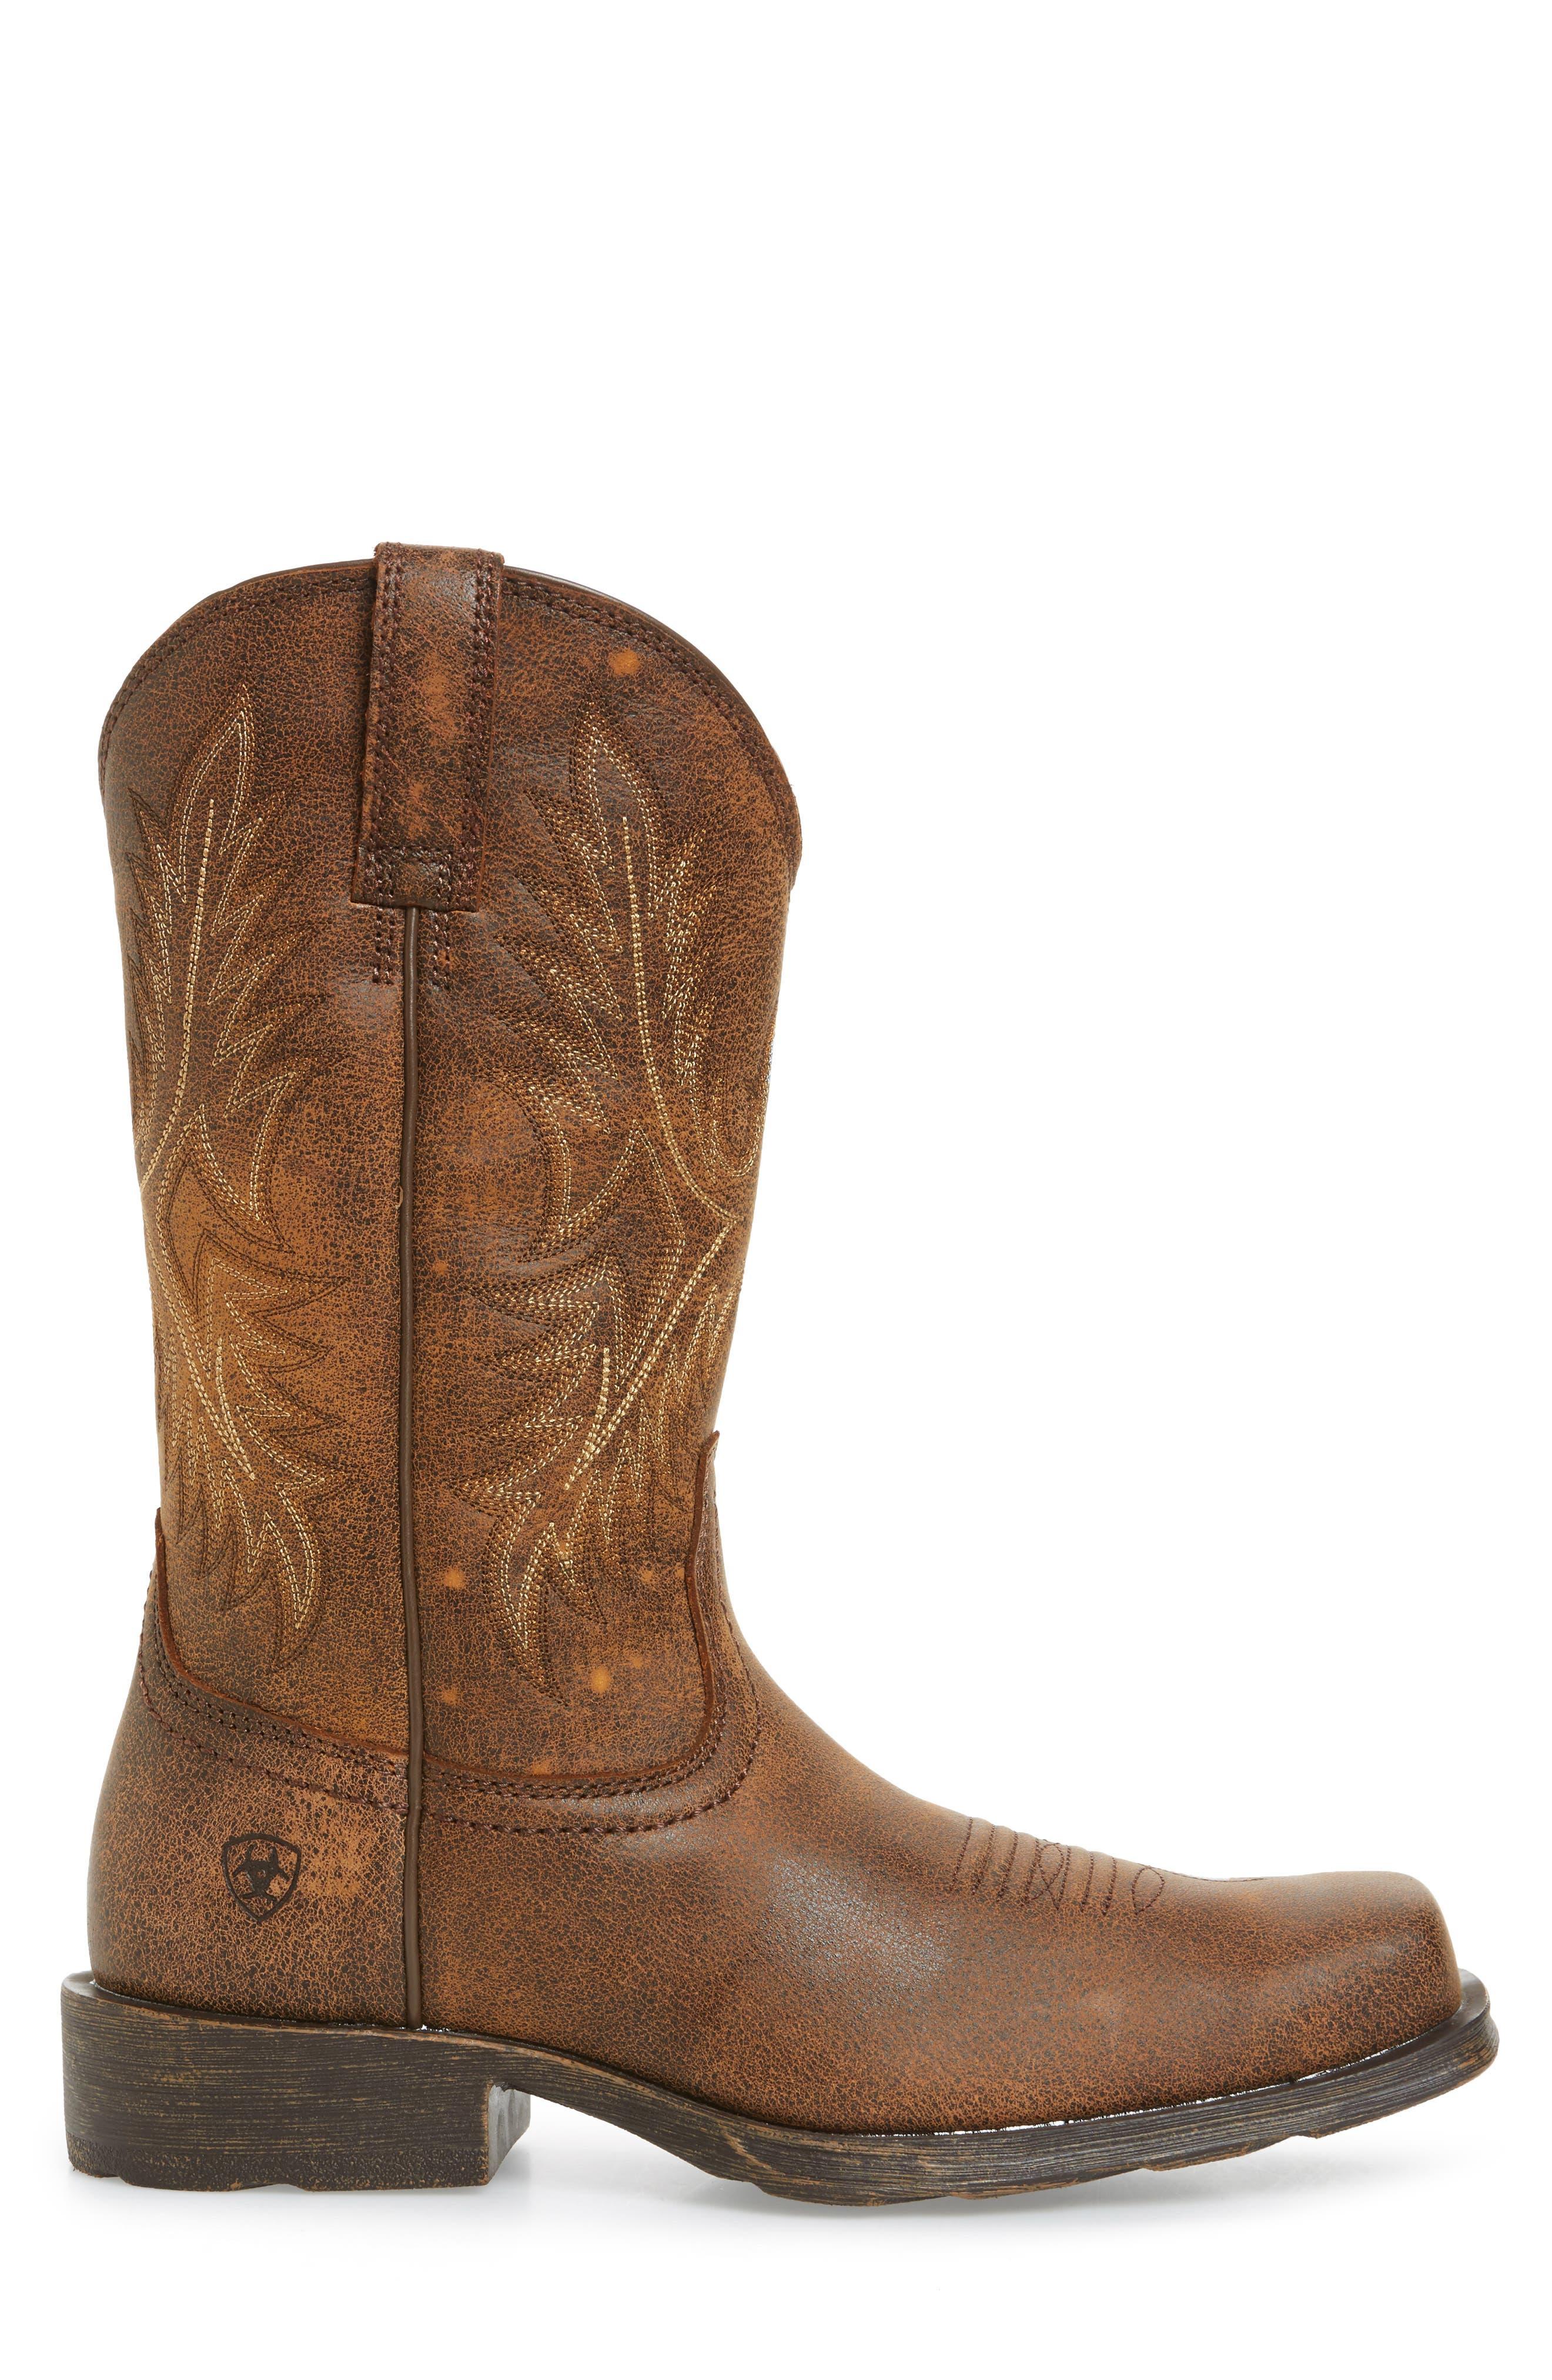 Western Rambler Cowboy Boot,                             Alternate thumbnail 3, color,                             Vintage Bomber Leather